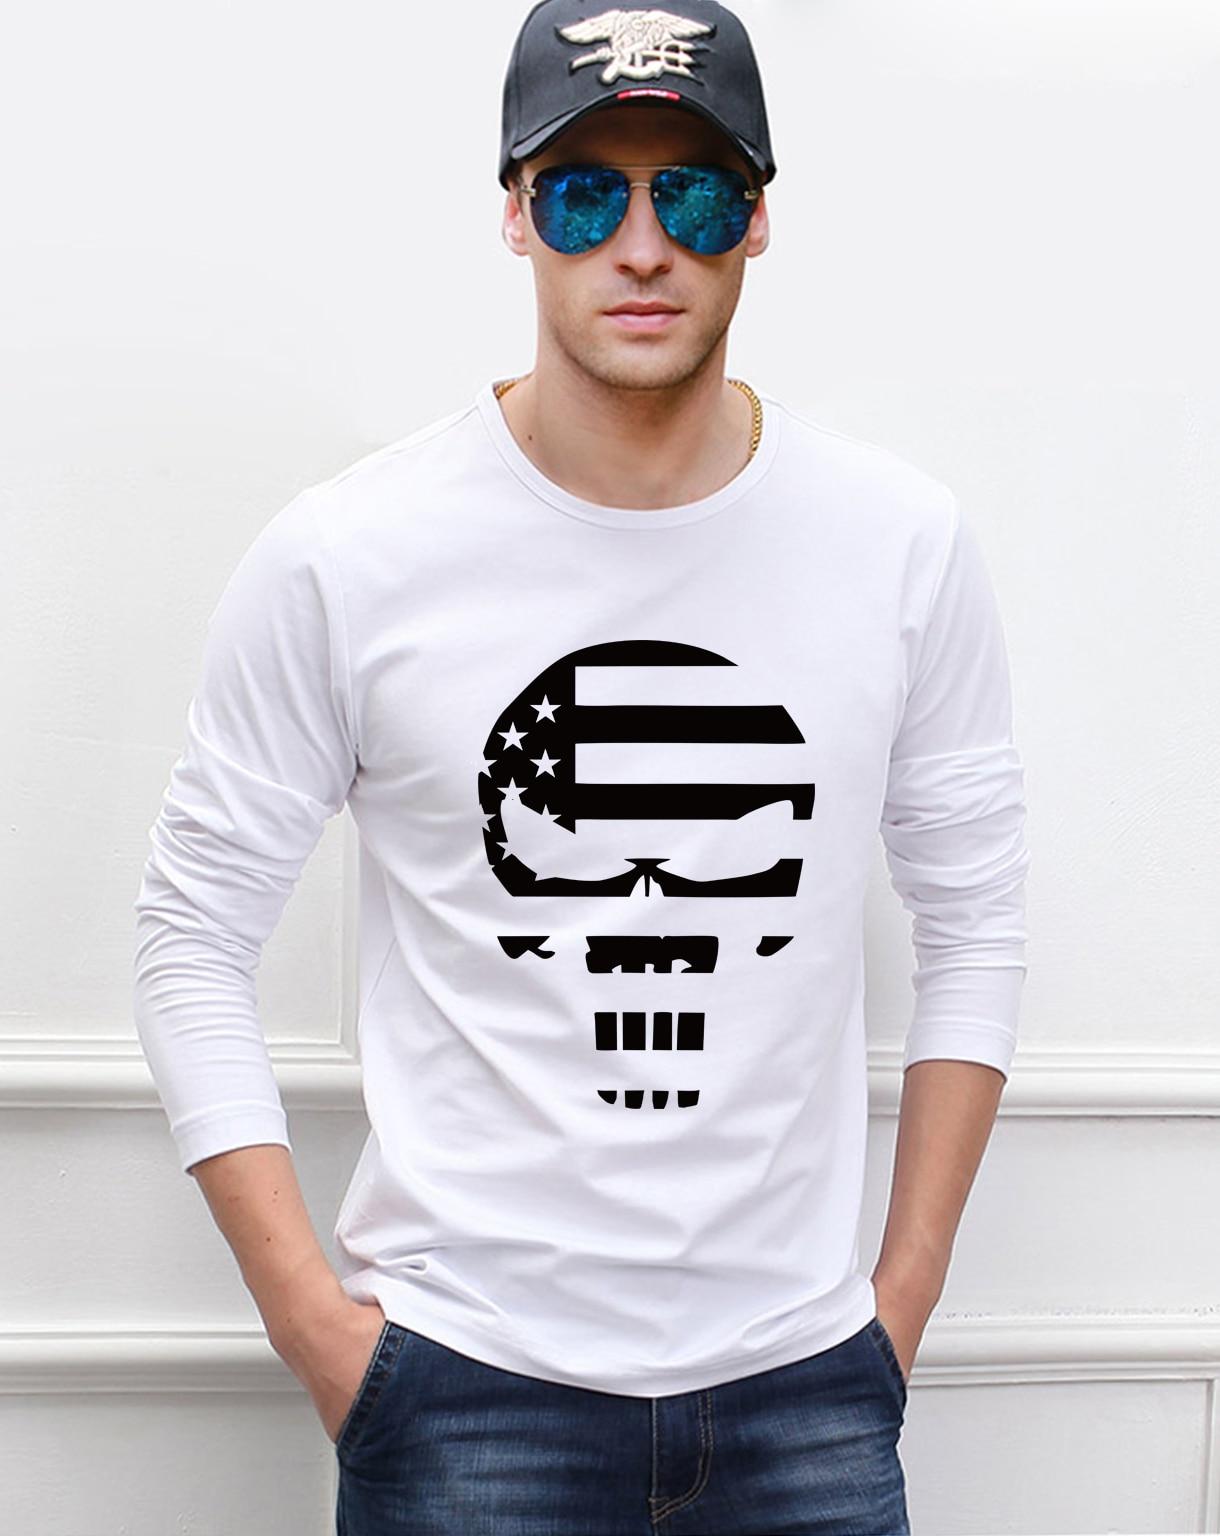 American Sniper Chris Kyle  Skull Navy Seal Team Legend 2019 new spring men's long sleeve T-shirts hip hop men t shirt